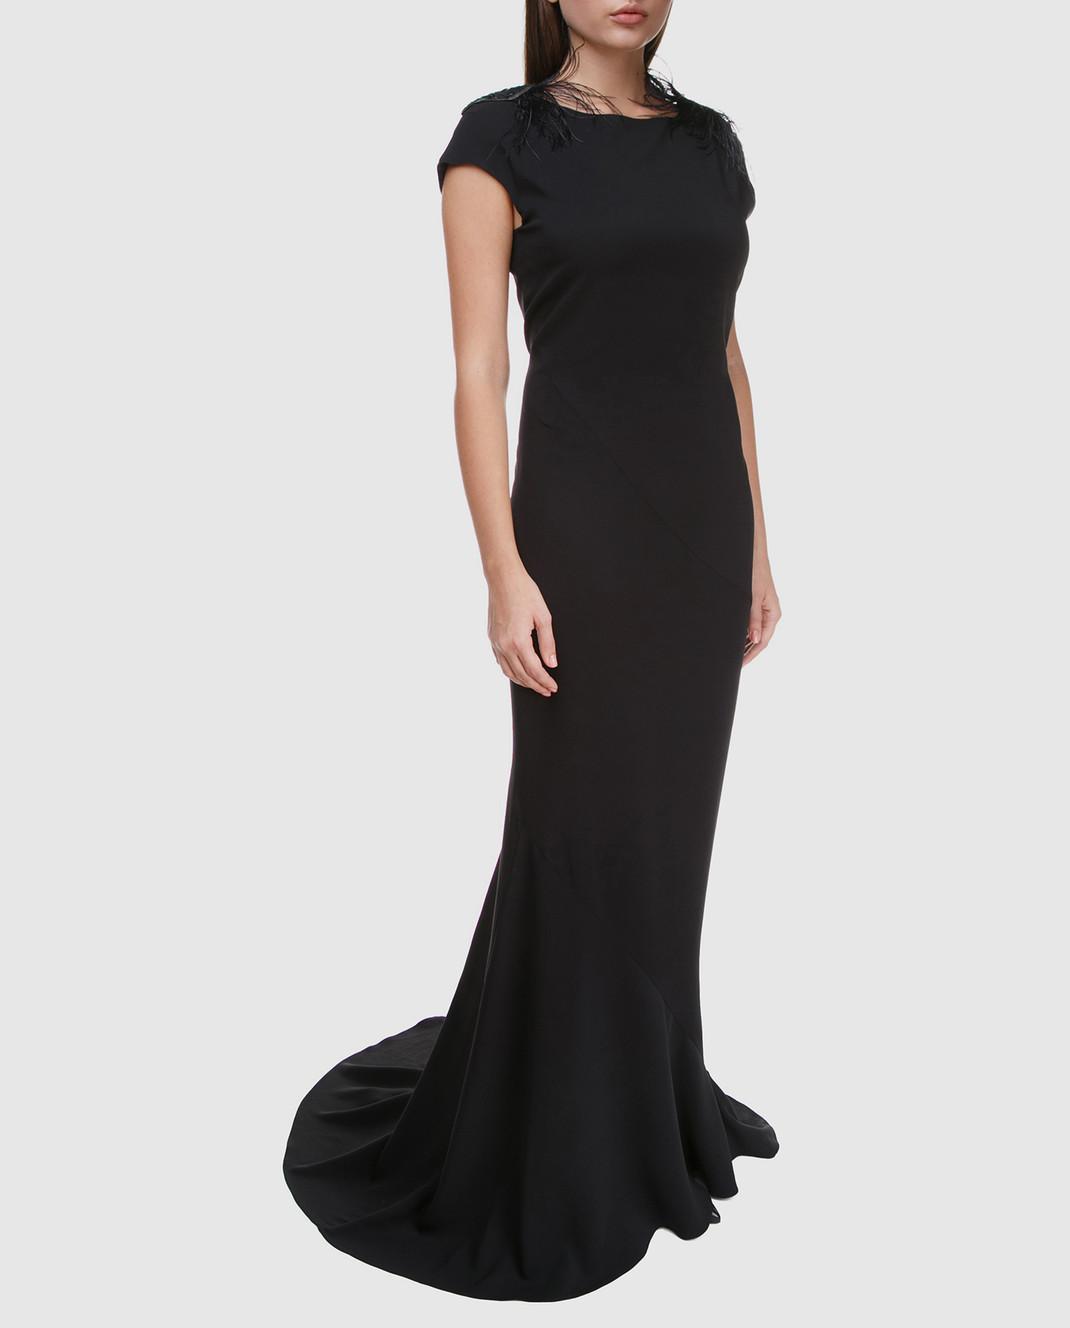 Brunello Cucinelli Черное платье MA970AE661 изображение 3